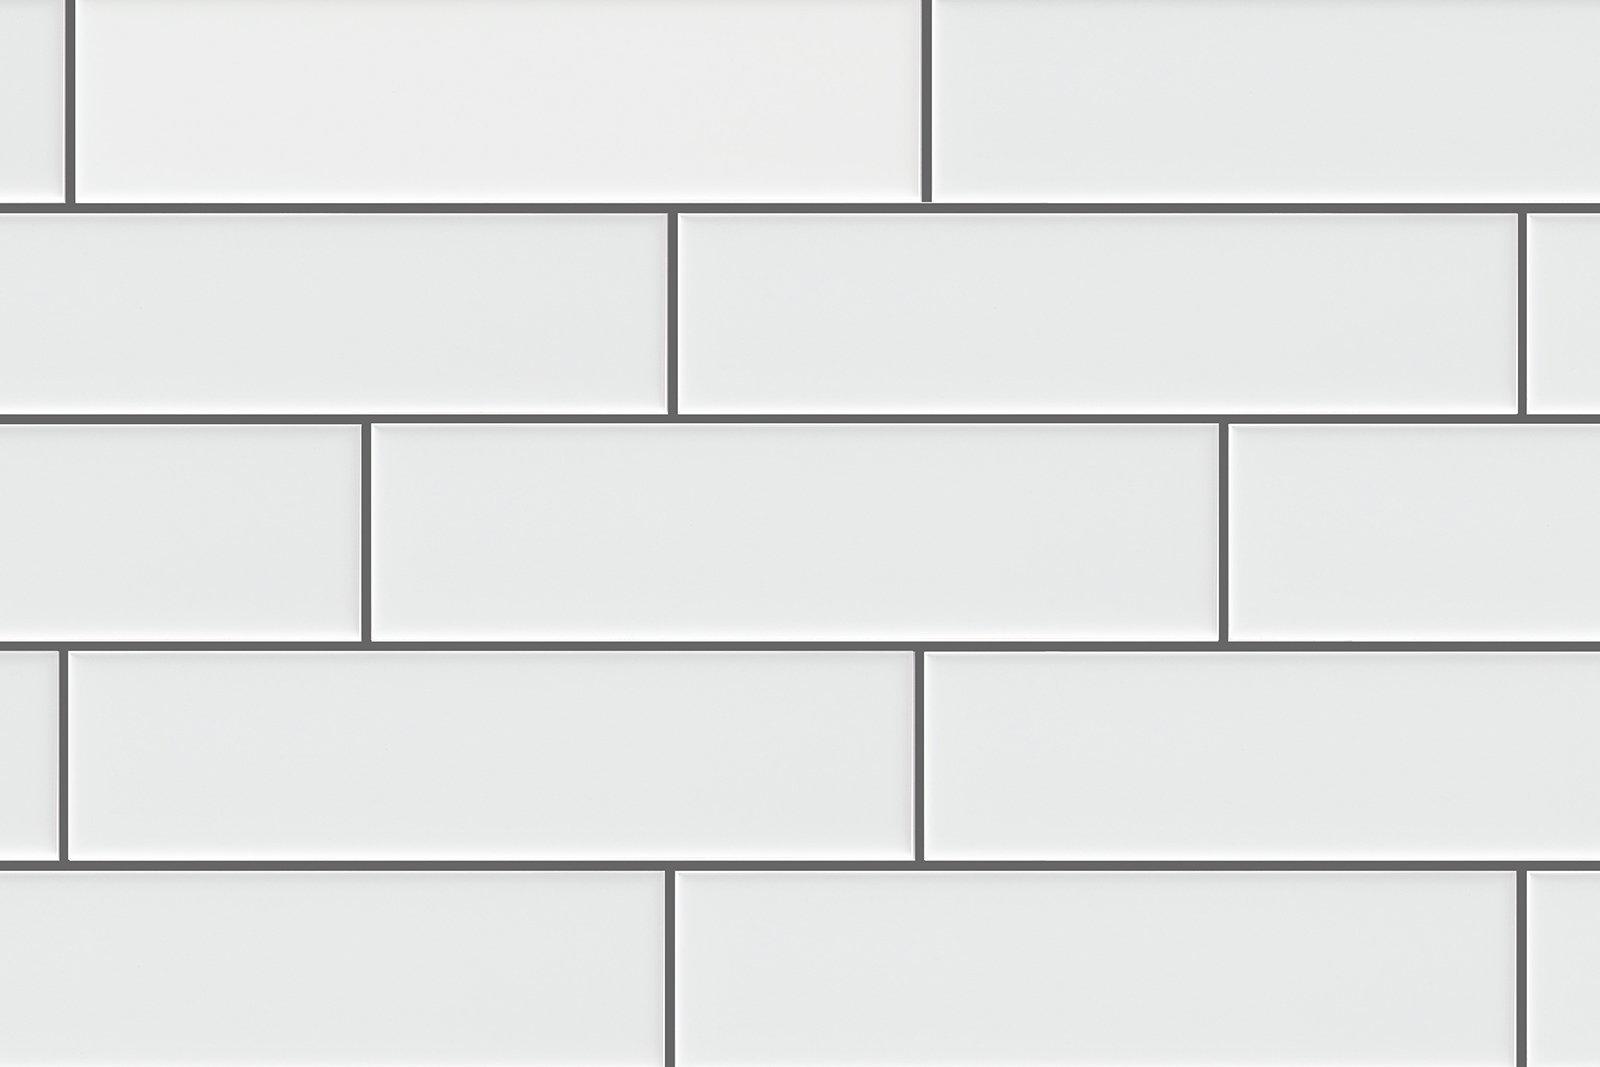 White Porcelain Subway Tile Gloss Finish 2'' X 8'' ( 88 pieces- Box of 10 Sqft), Wall Tile, Floor Tile, Backsplash Tile, Bathroom Tile, Vogue Brand Designed in Italy by Vogue Tile